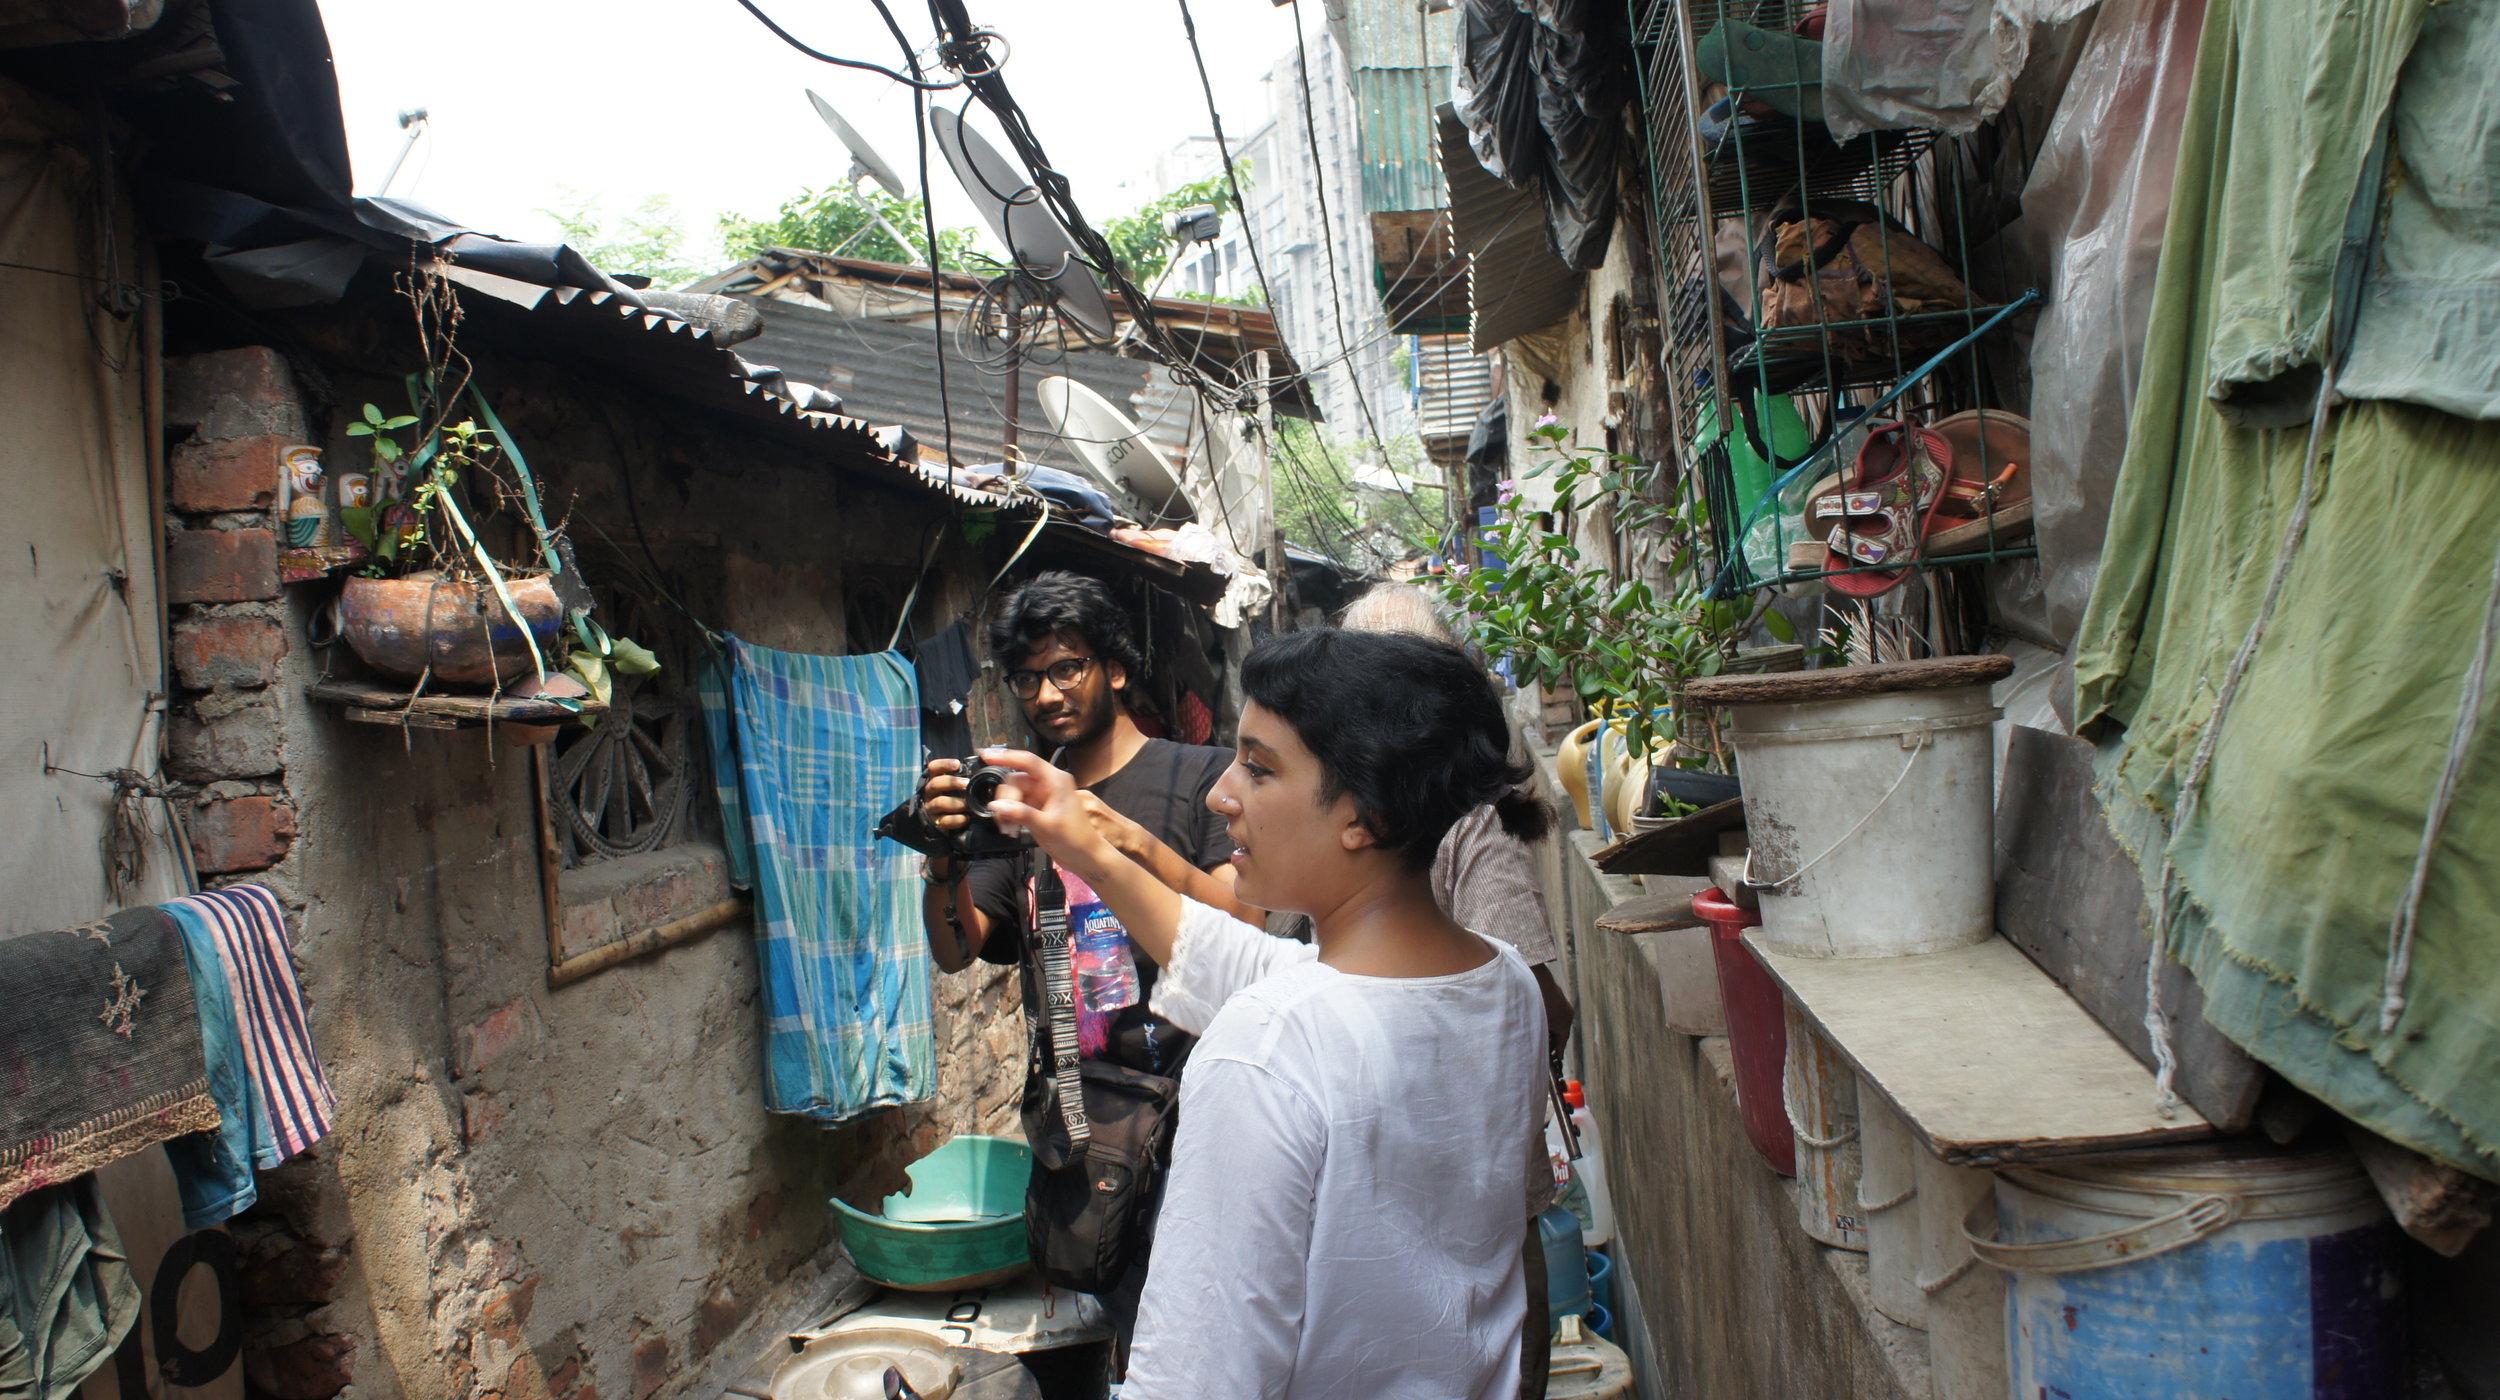 Debraj Jana and Kiran Bhumber at New Alipore station slum